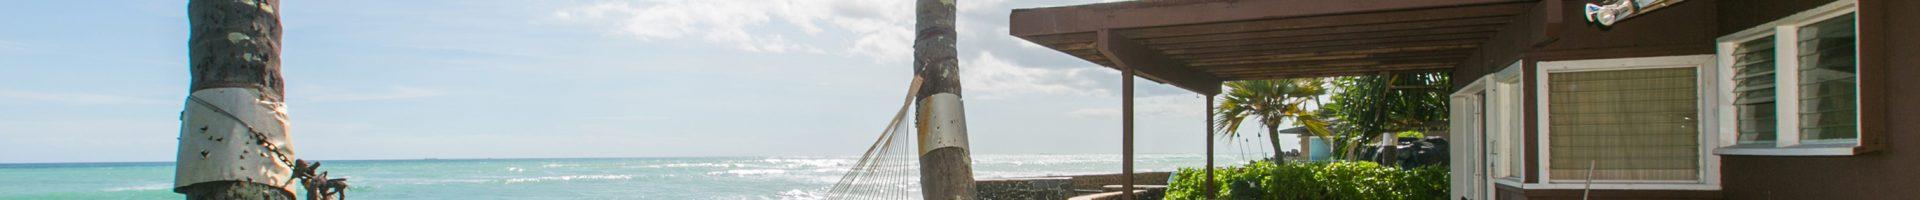 Ewa Beach | 91-429 Pupu Street